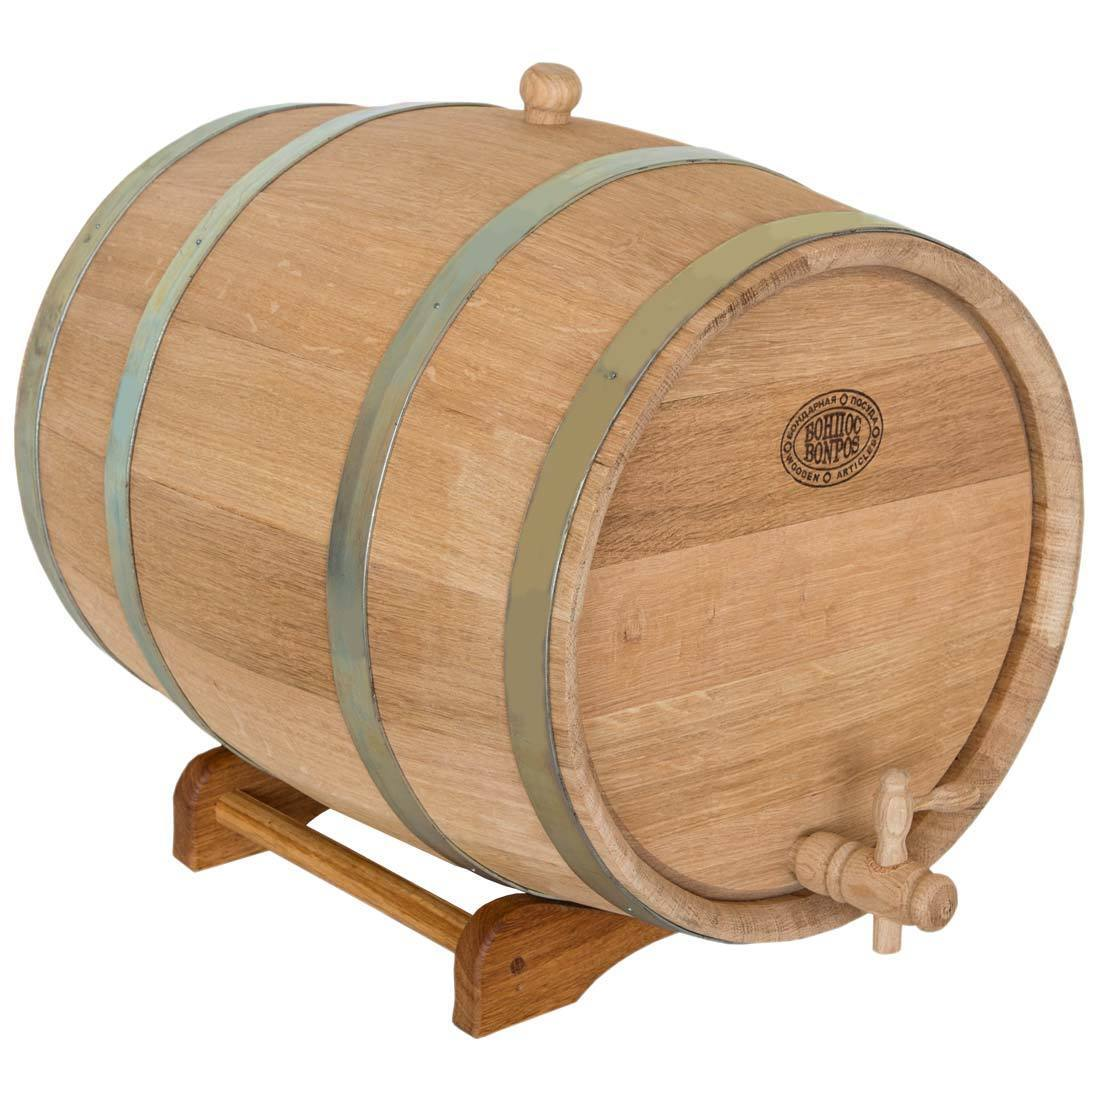 3L-Brown Stainless Steel Liner Durable Oak Wood Home Bar Wine Barrel Keg Container for Beverage Beer Whiskey